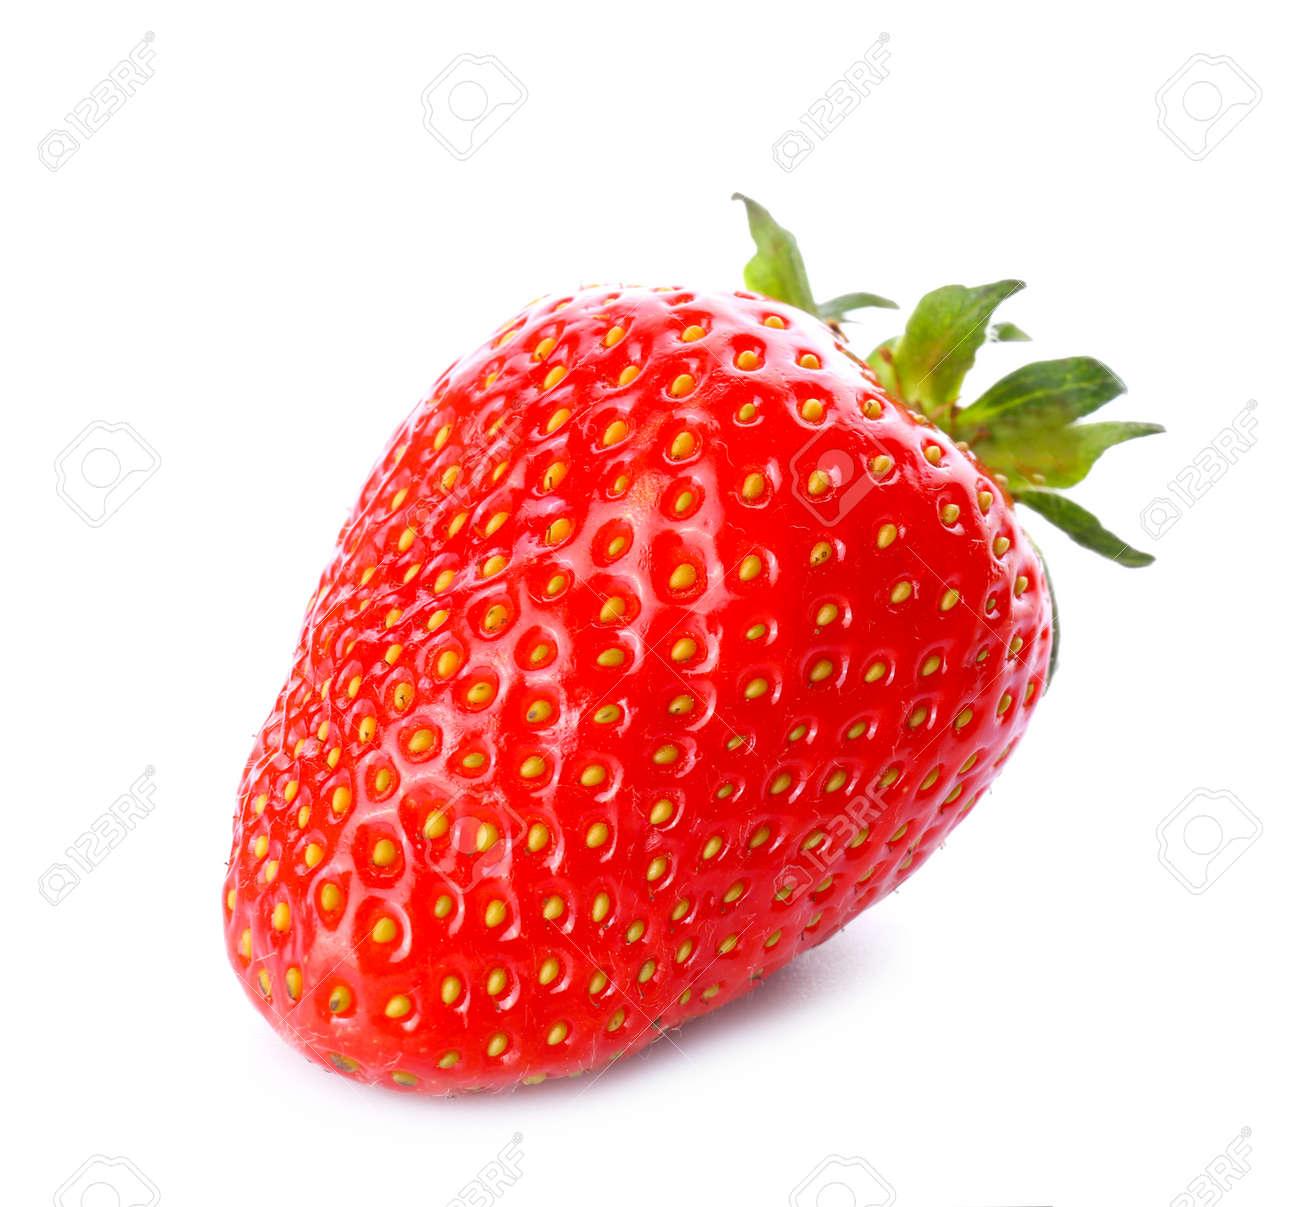 Sweet ripe strawberry on white background - 166690637